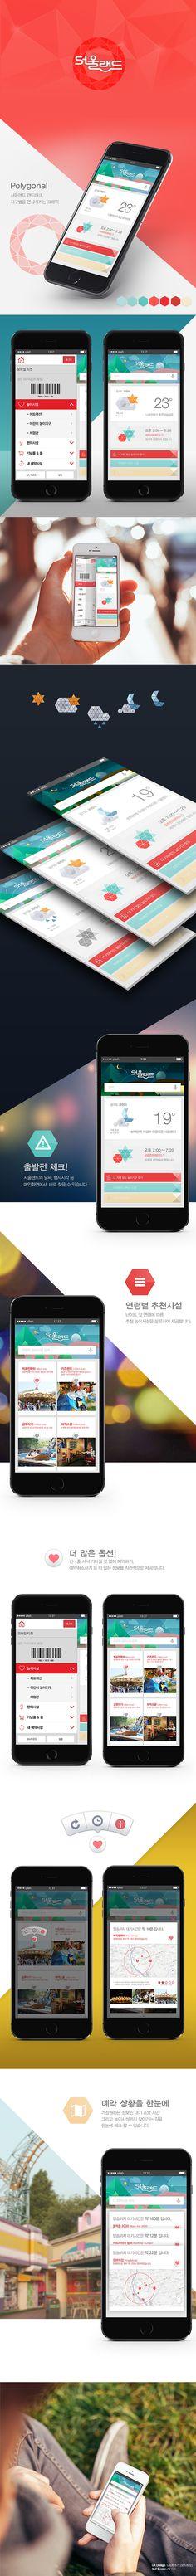 Seoul Land mobile APP concept - 서울랜드 모바일앱 콘셉 on Behance